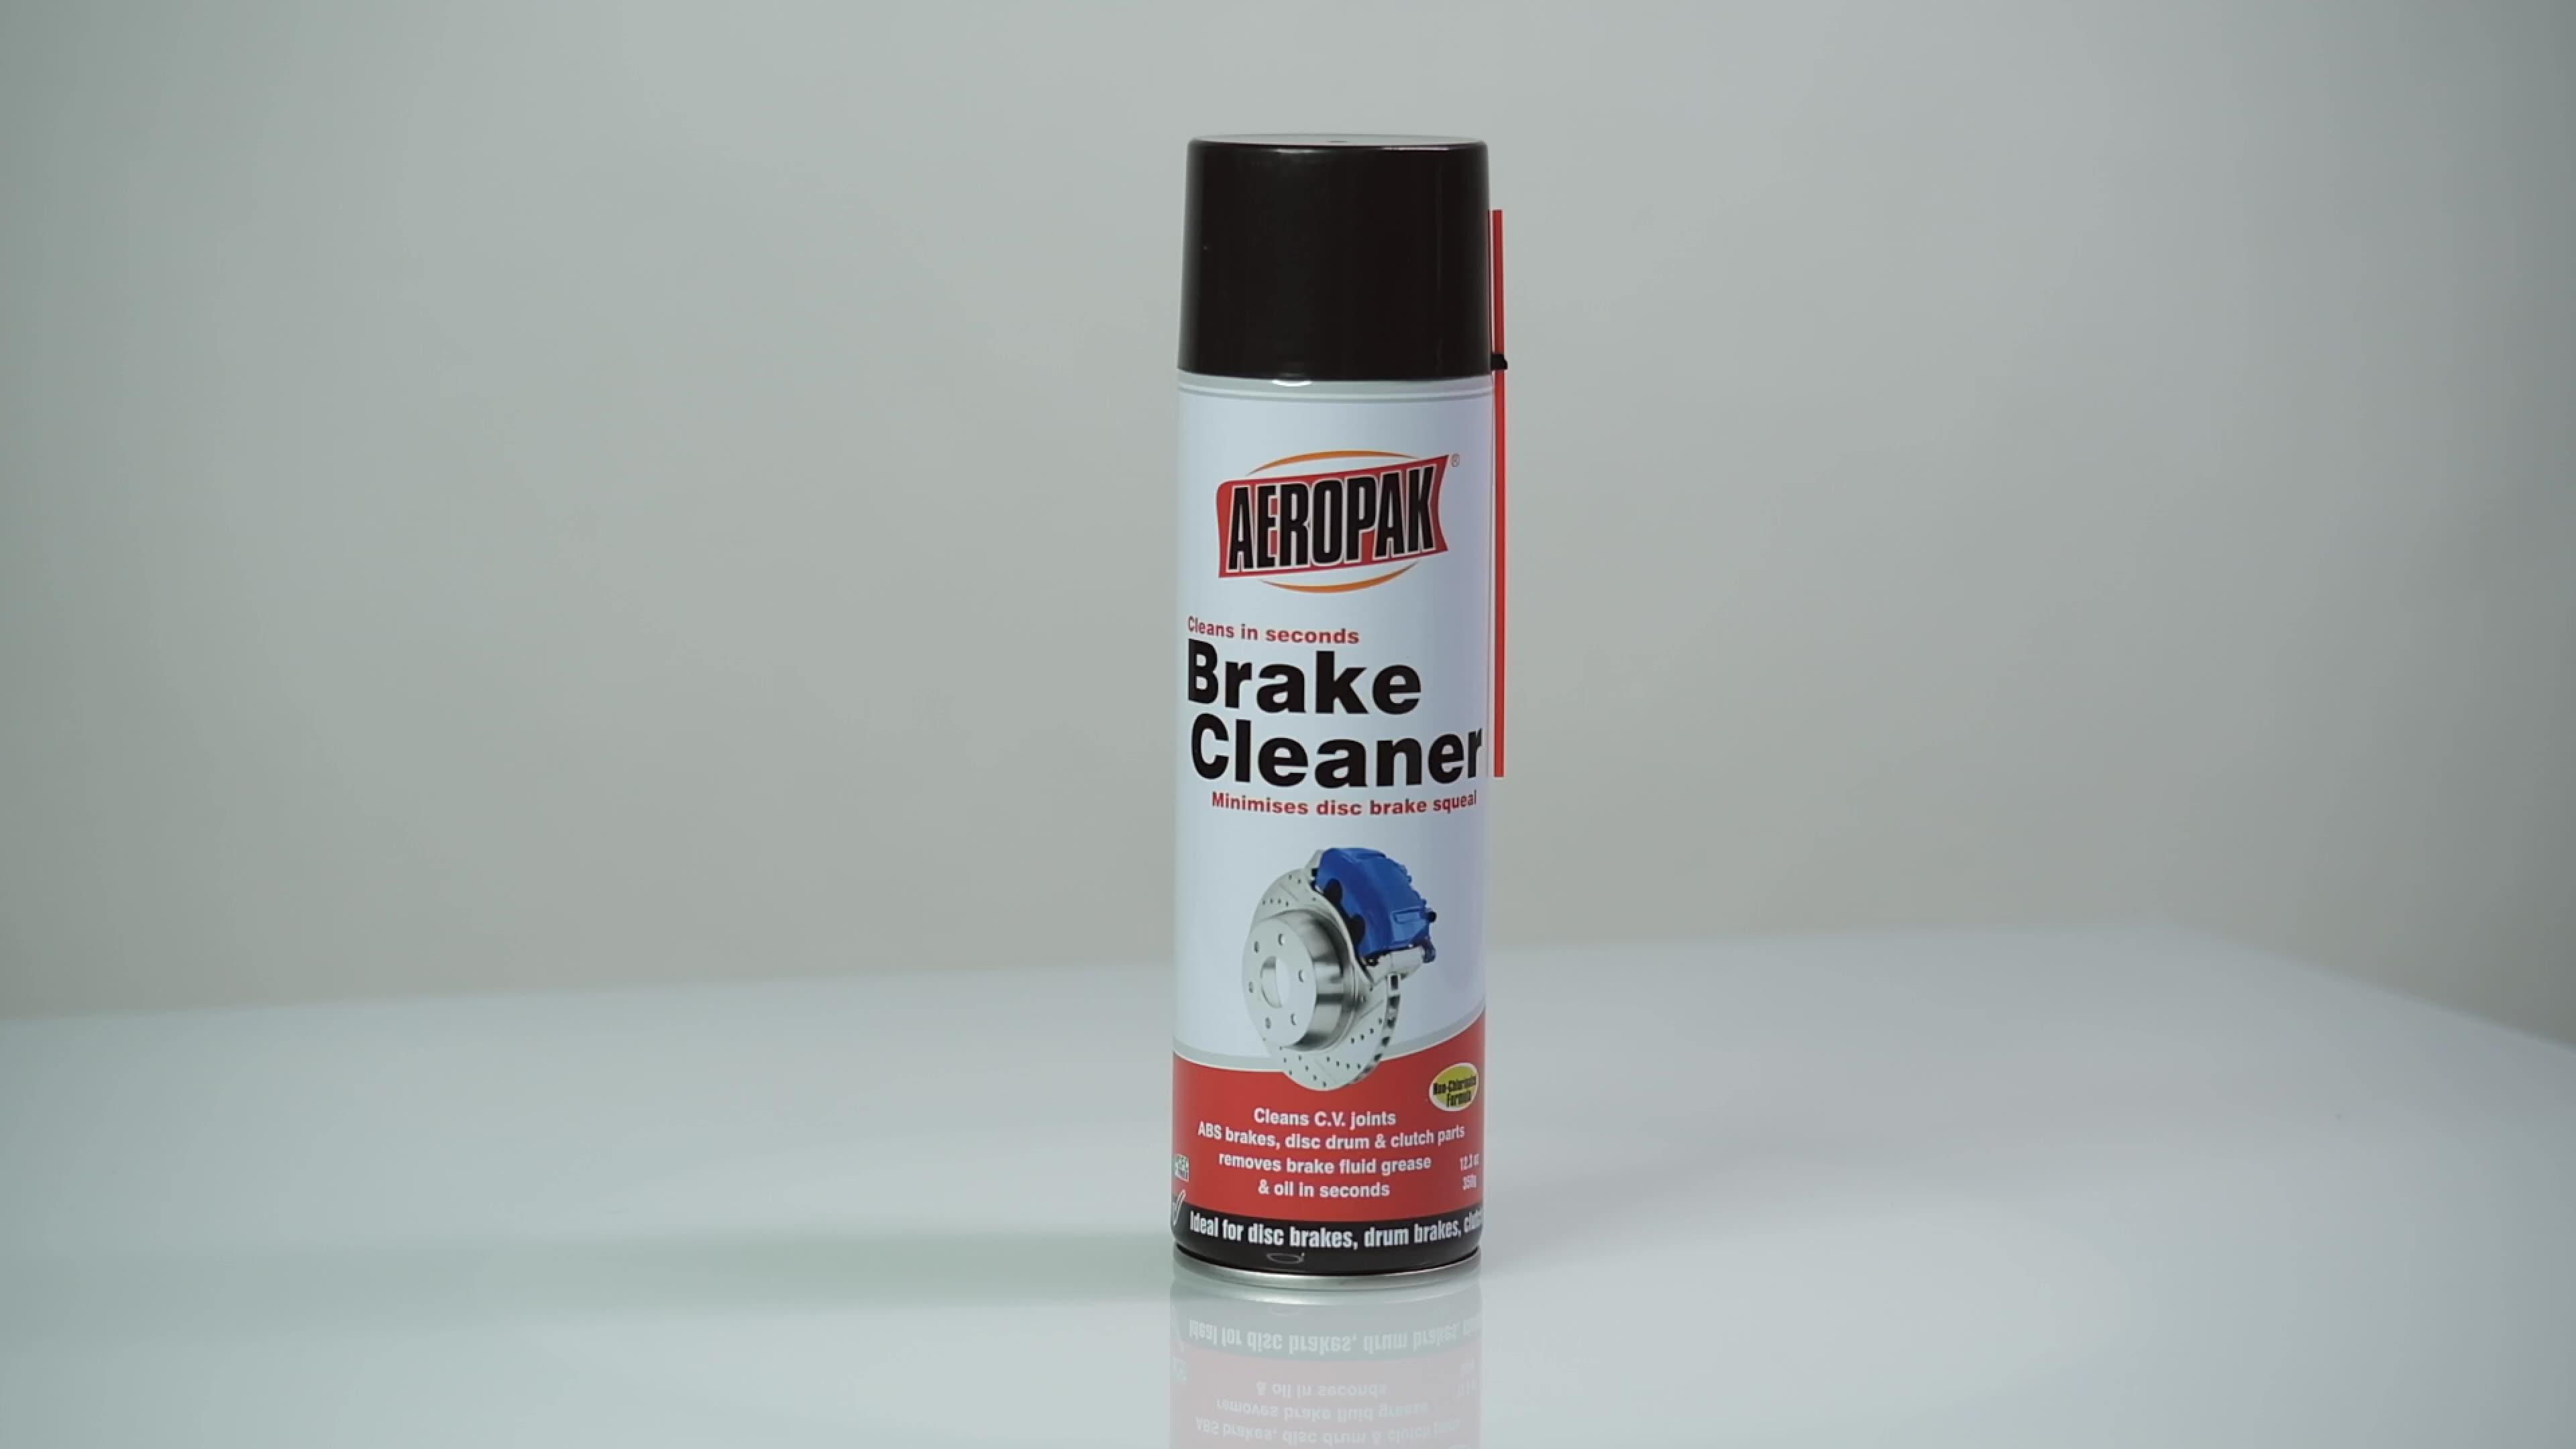 Aeropak Multi purpose Auto Washing Brake Cleaner for car